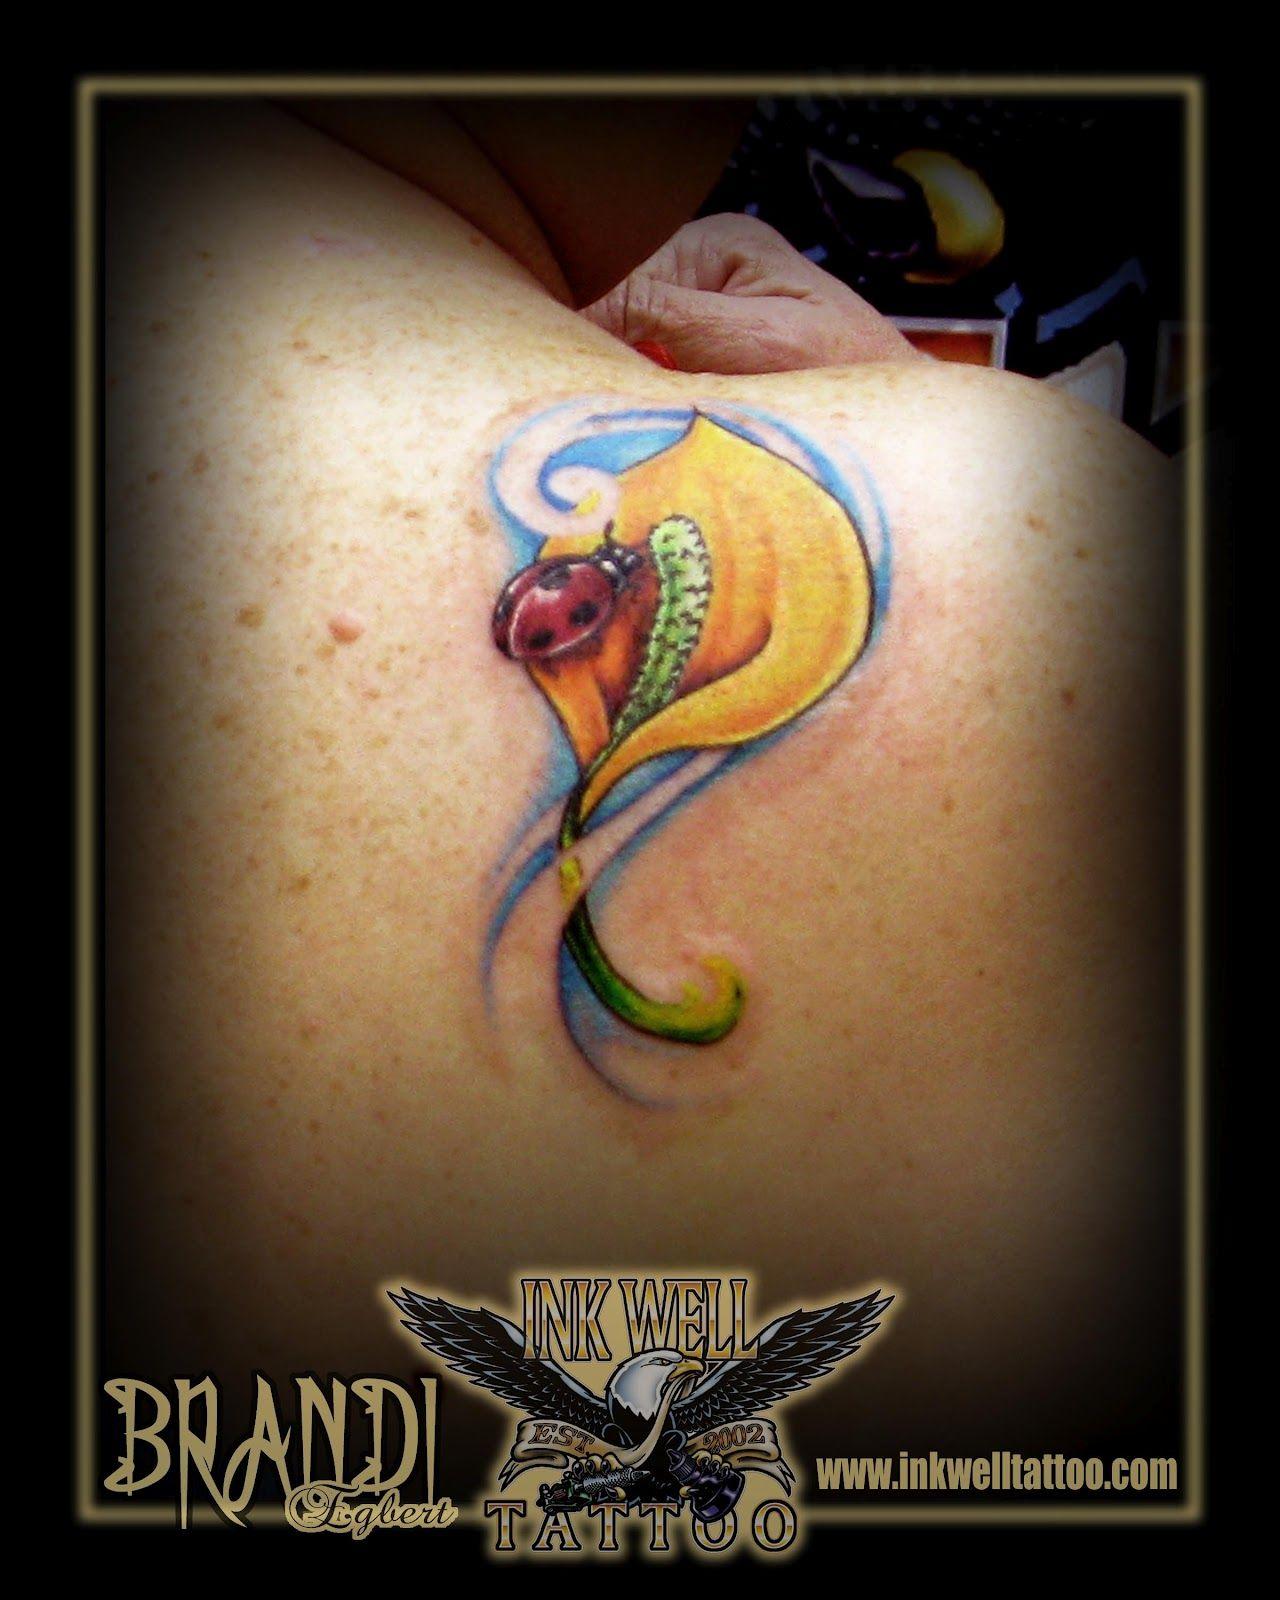 Brandi egbert ink well tattoo ladybug and peace lily www brandi egbert ink well tattoo ladybug and peace lily inkwelltattoo dhlflorist Image collections